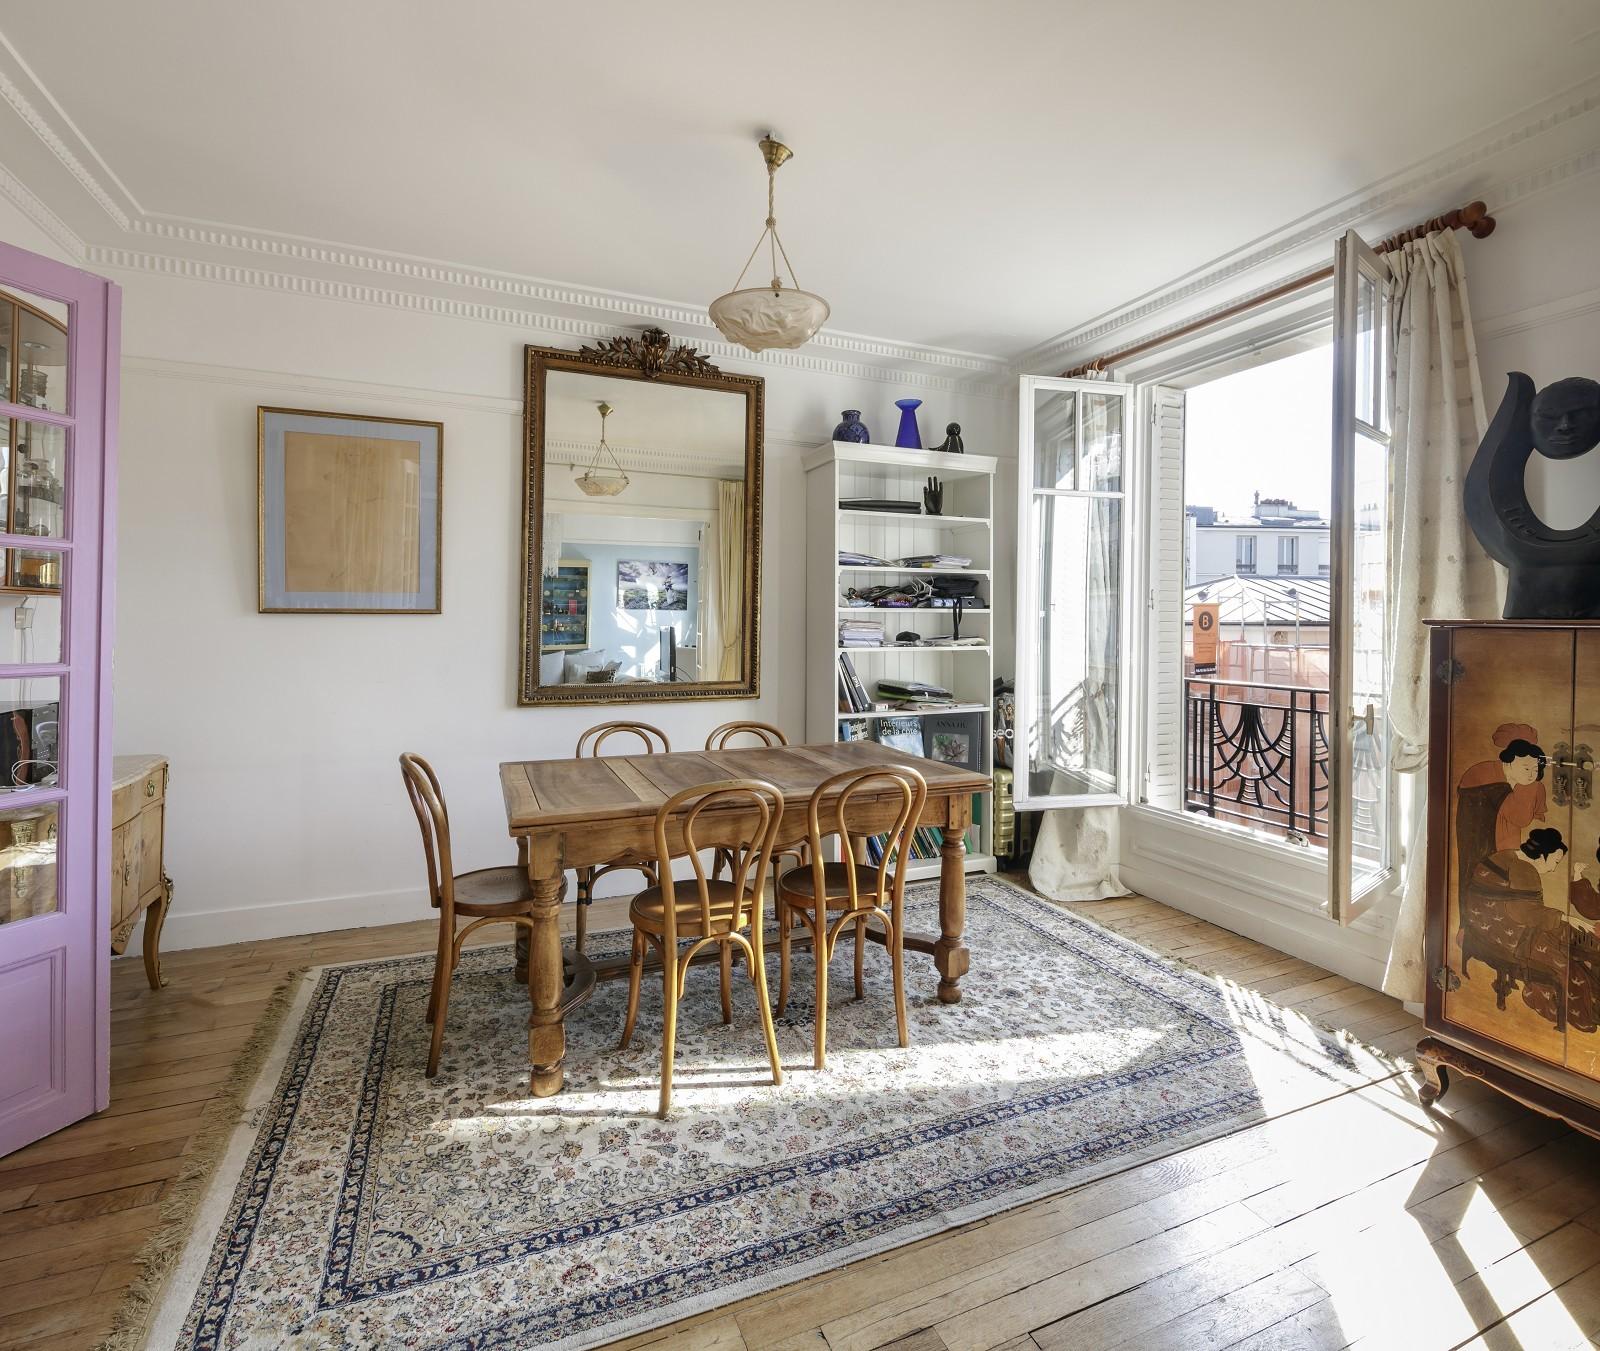 PARIS 12 | GARE DE LYON | HAUSSMANN-STYLE APARTMENT | 3-4 BEDROOMS AND MAID'S ROOM